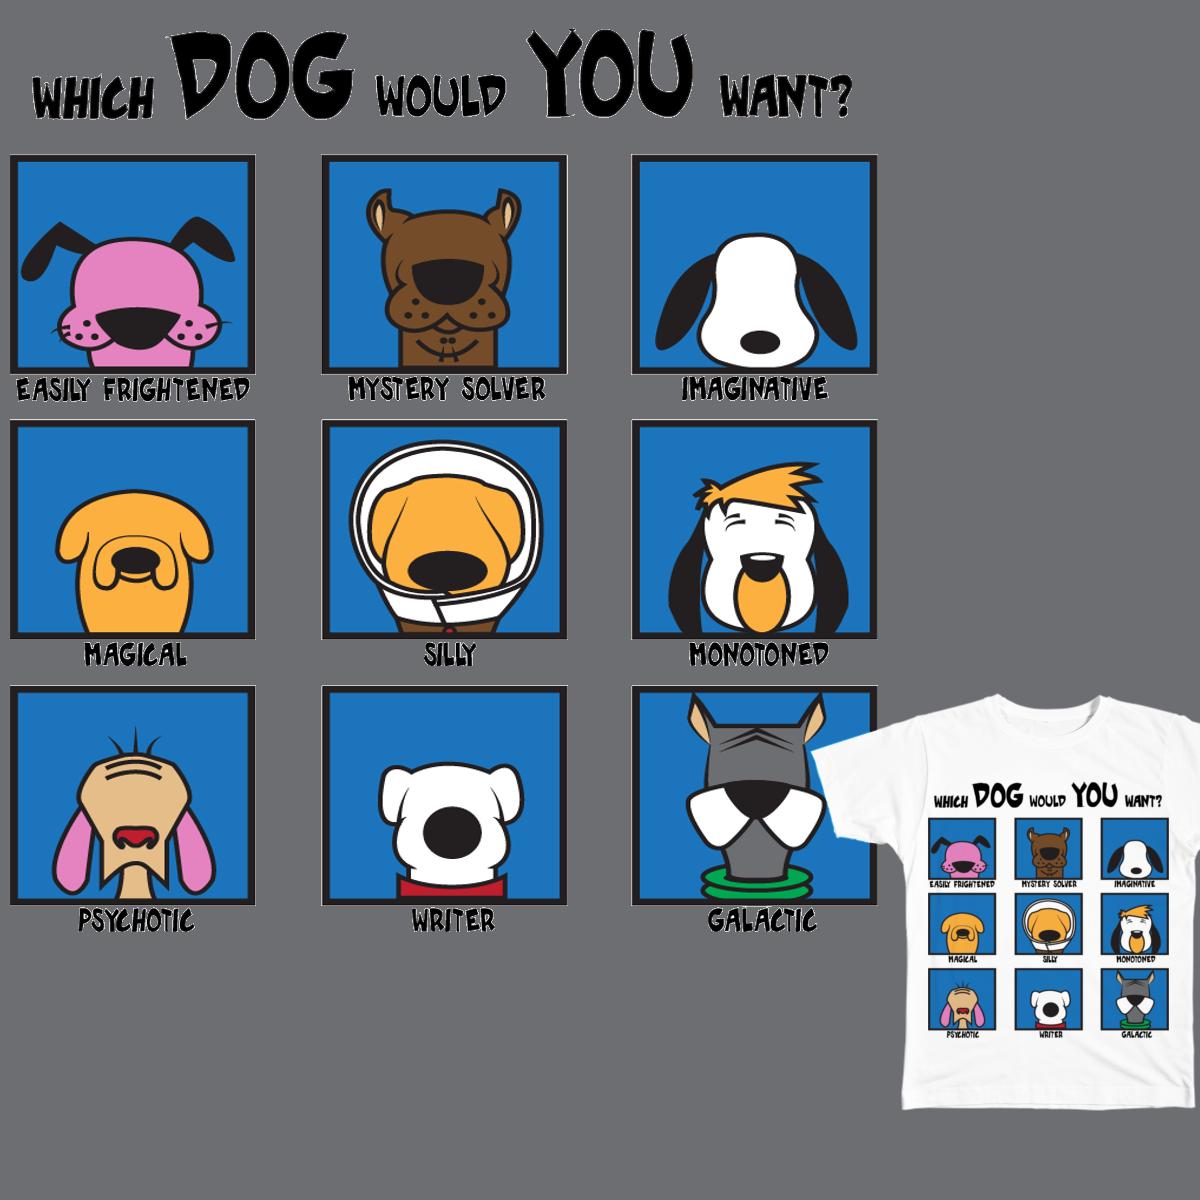 PICK A DOG! by caspertheghost on Threadless